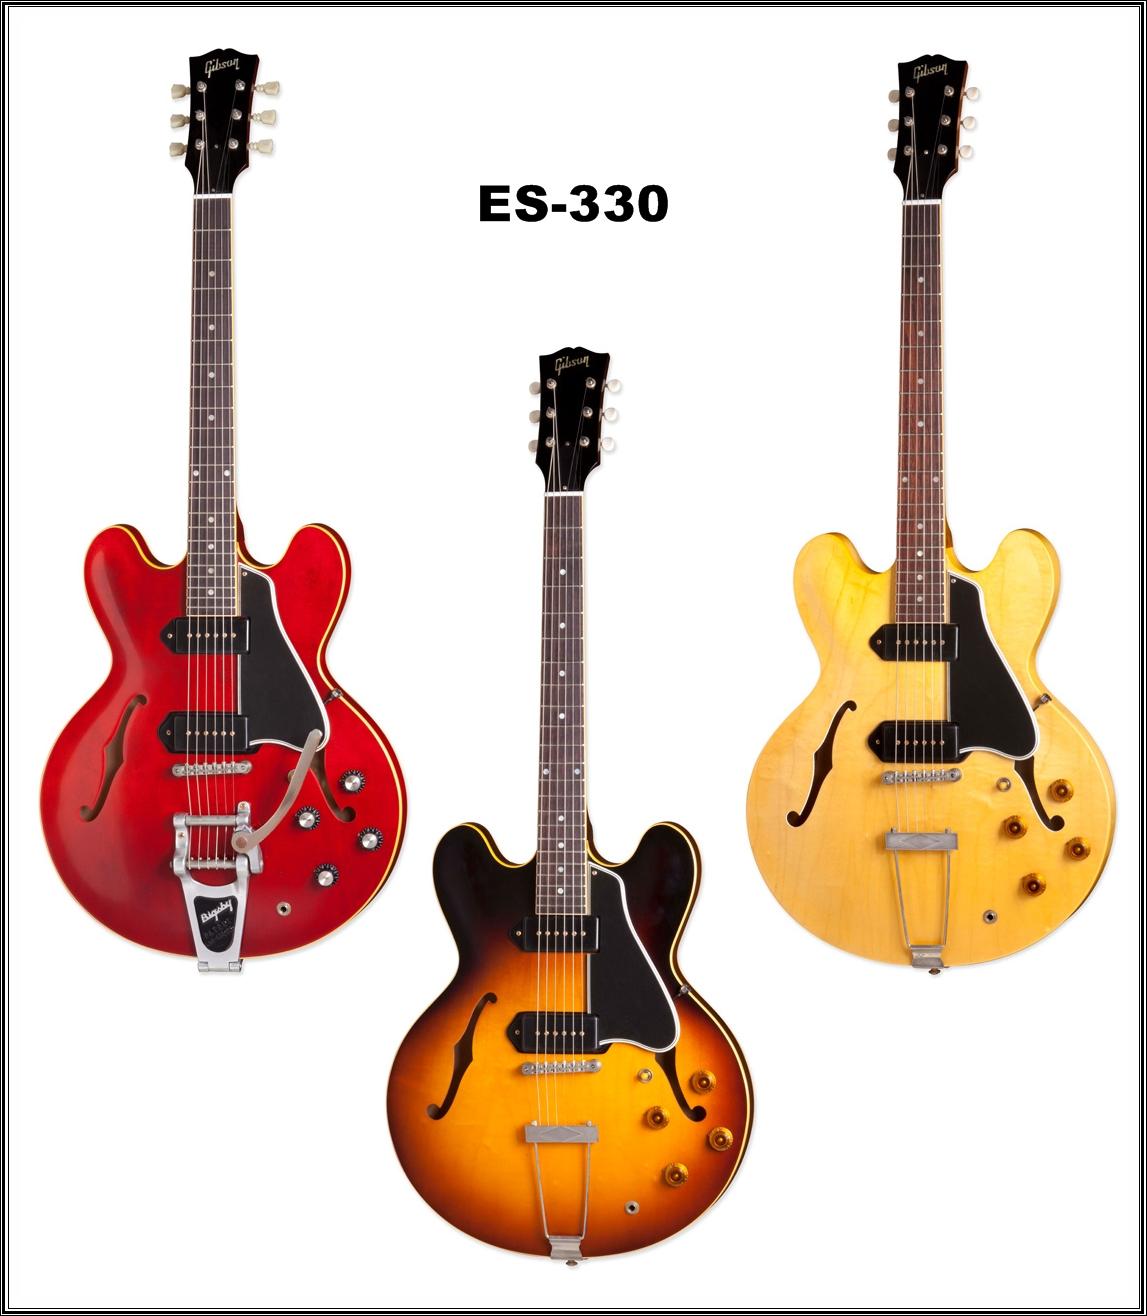 guitars blog the new gibson es 330. Black Bedroom Furniture Sets. Home Design Ideas